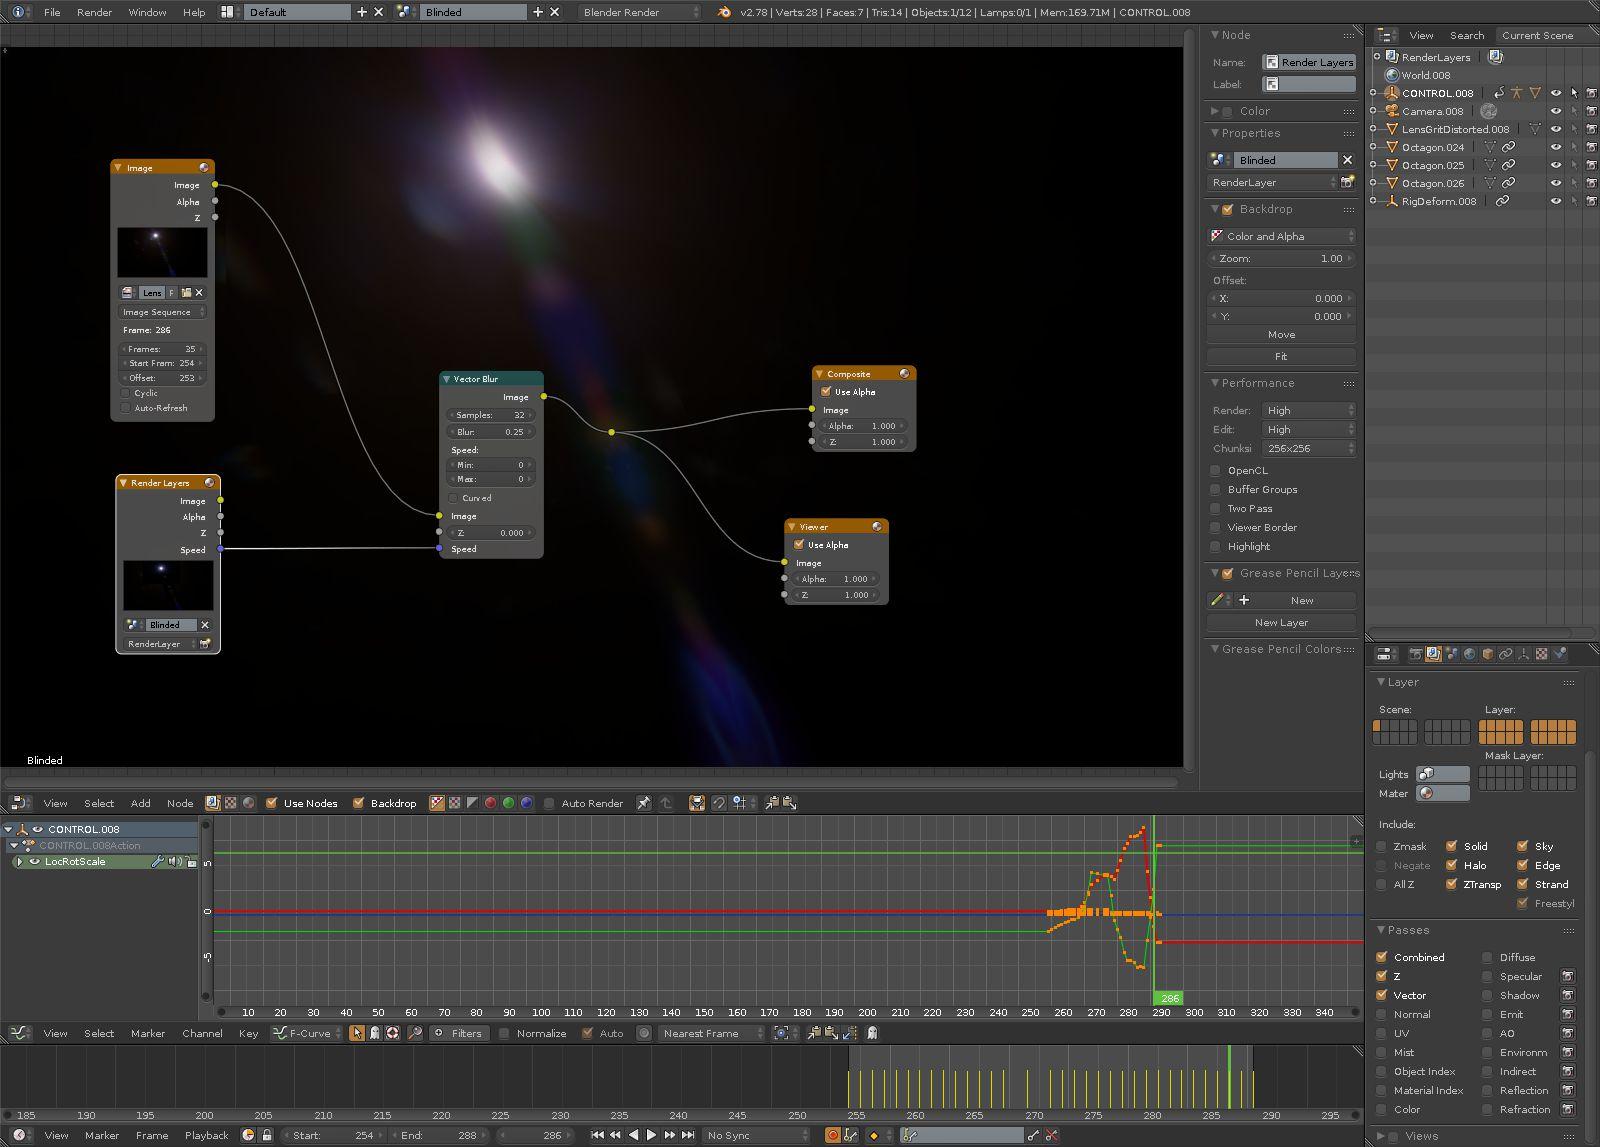 Generating camera flares back in Blender for later compositing in Nuke.